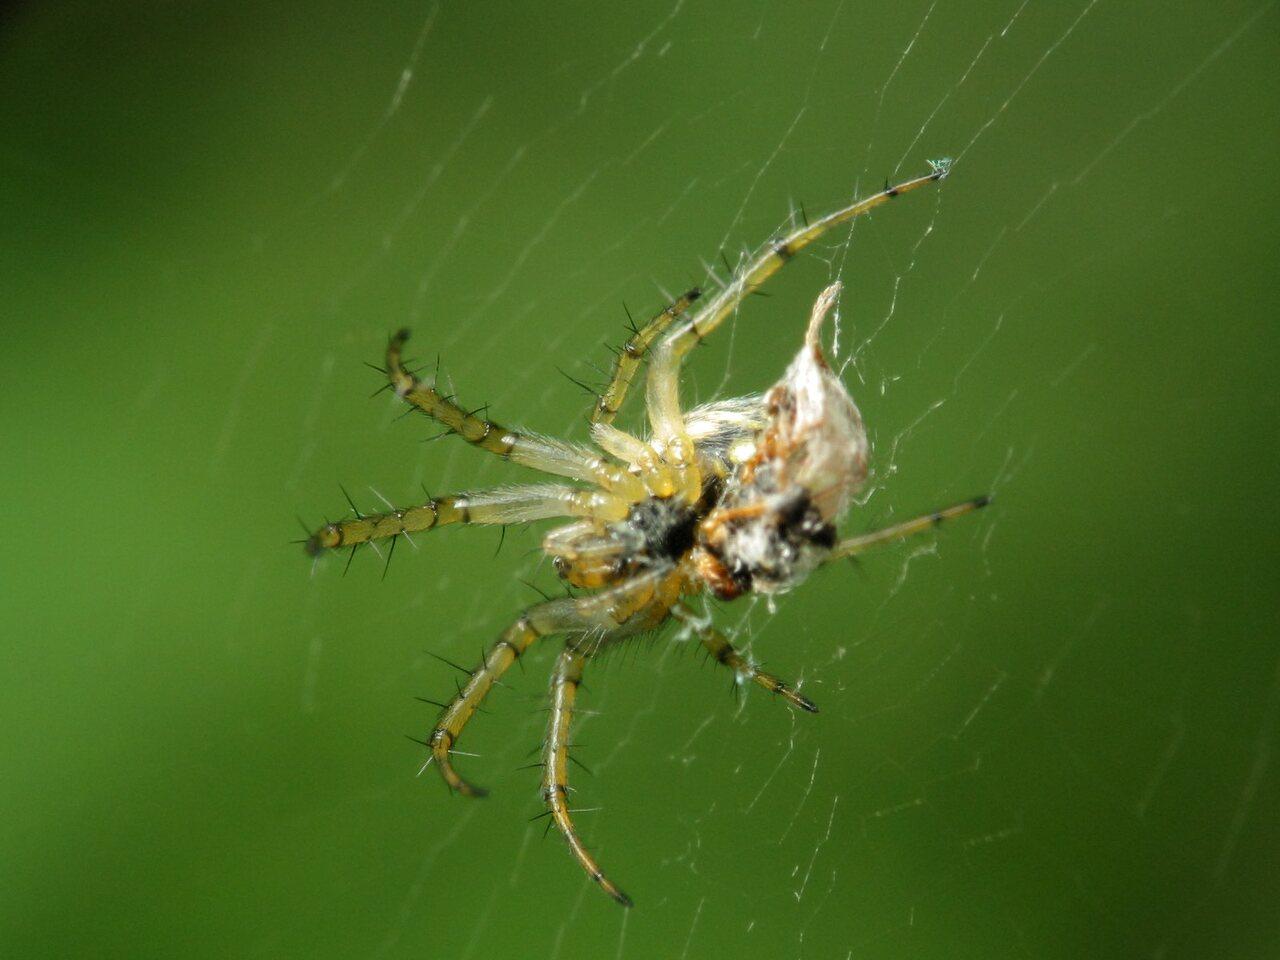 Araneae-1777.jpg